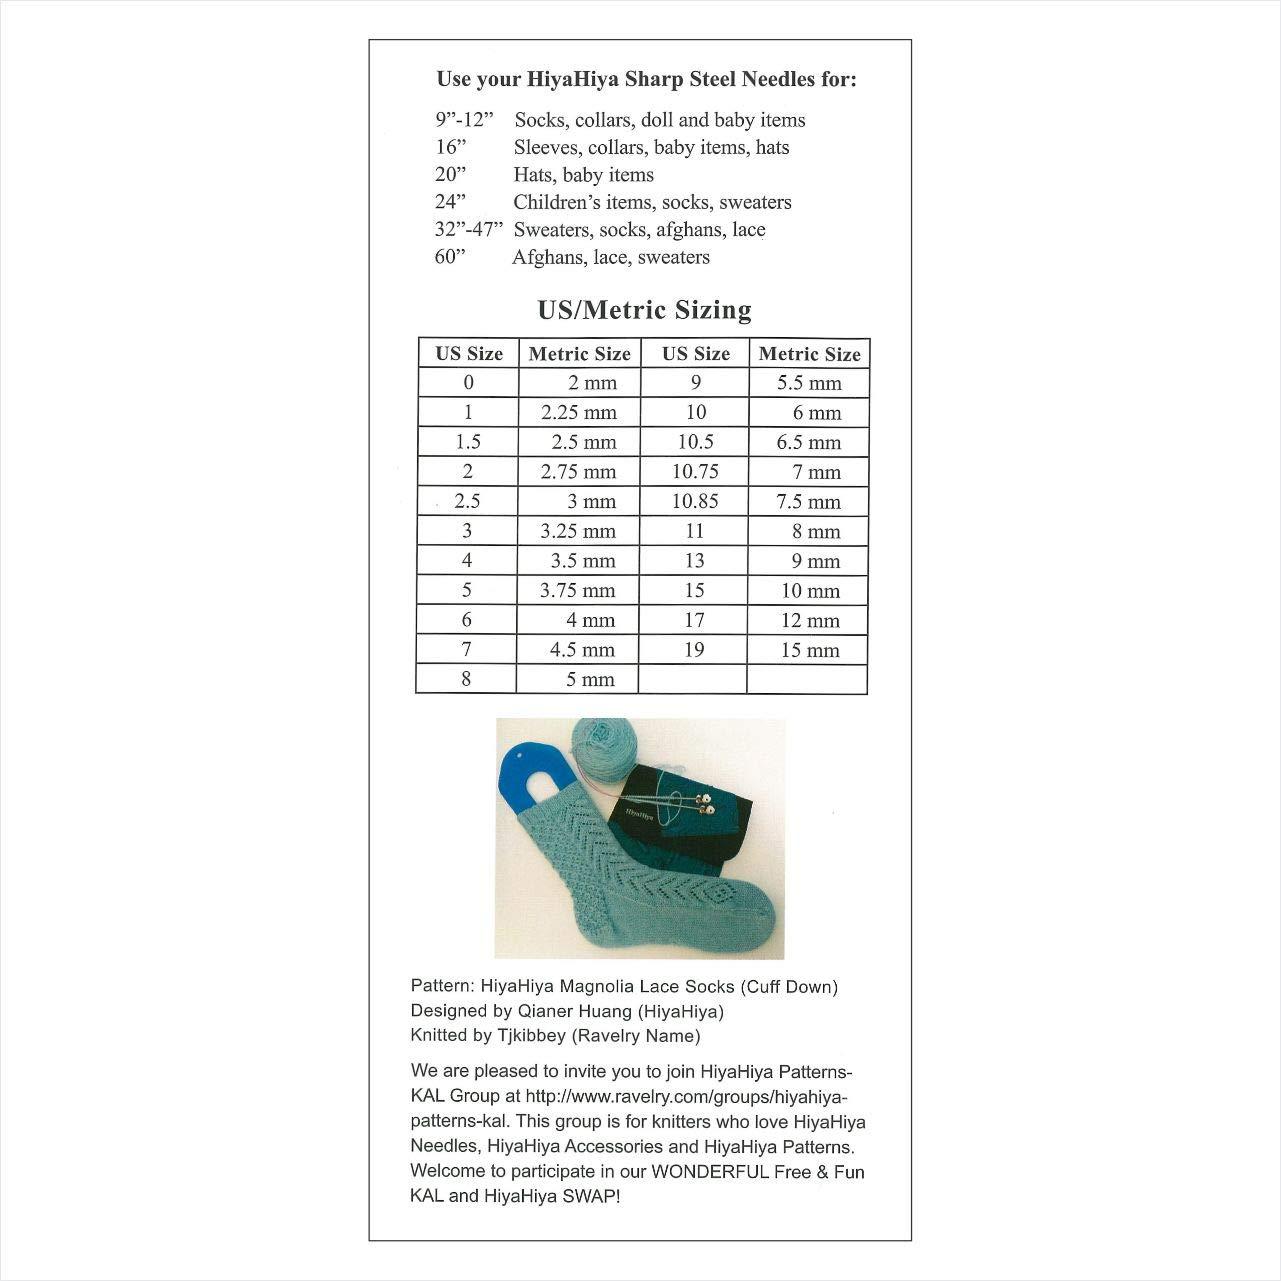 2.75mm HISTCIR9-2 23cm HiyaHiya Circular 9-inch Steel Knitting Needle; Size US 2